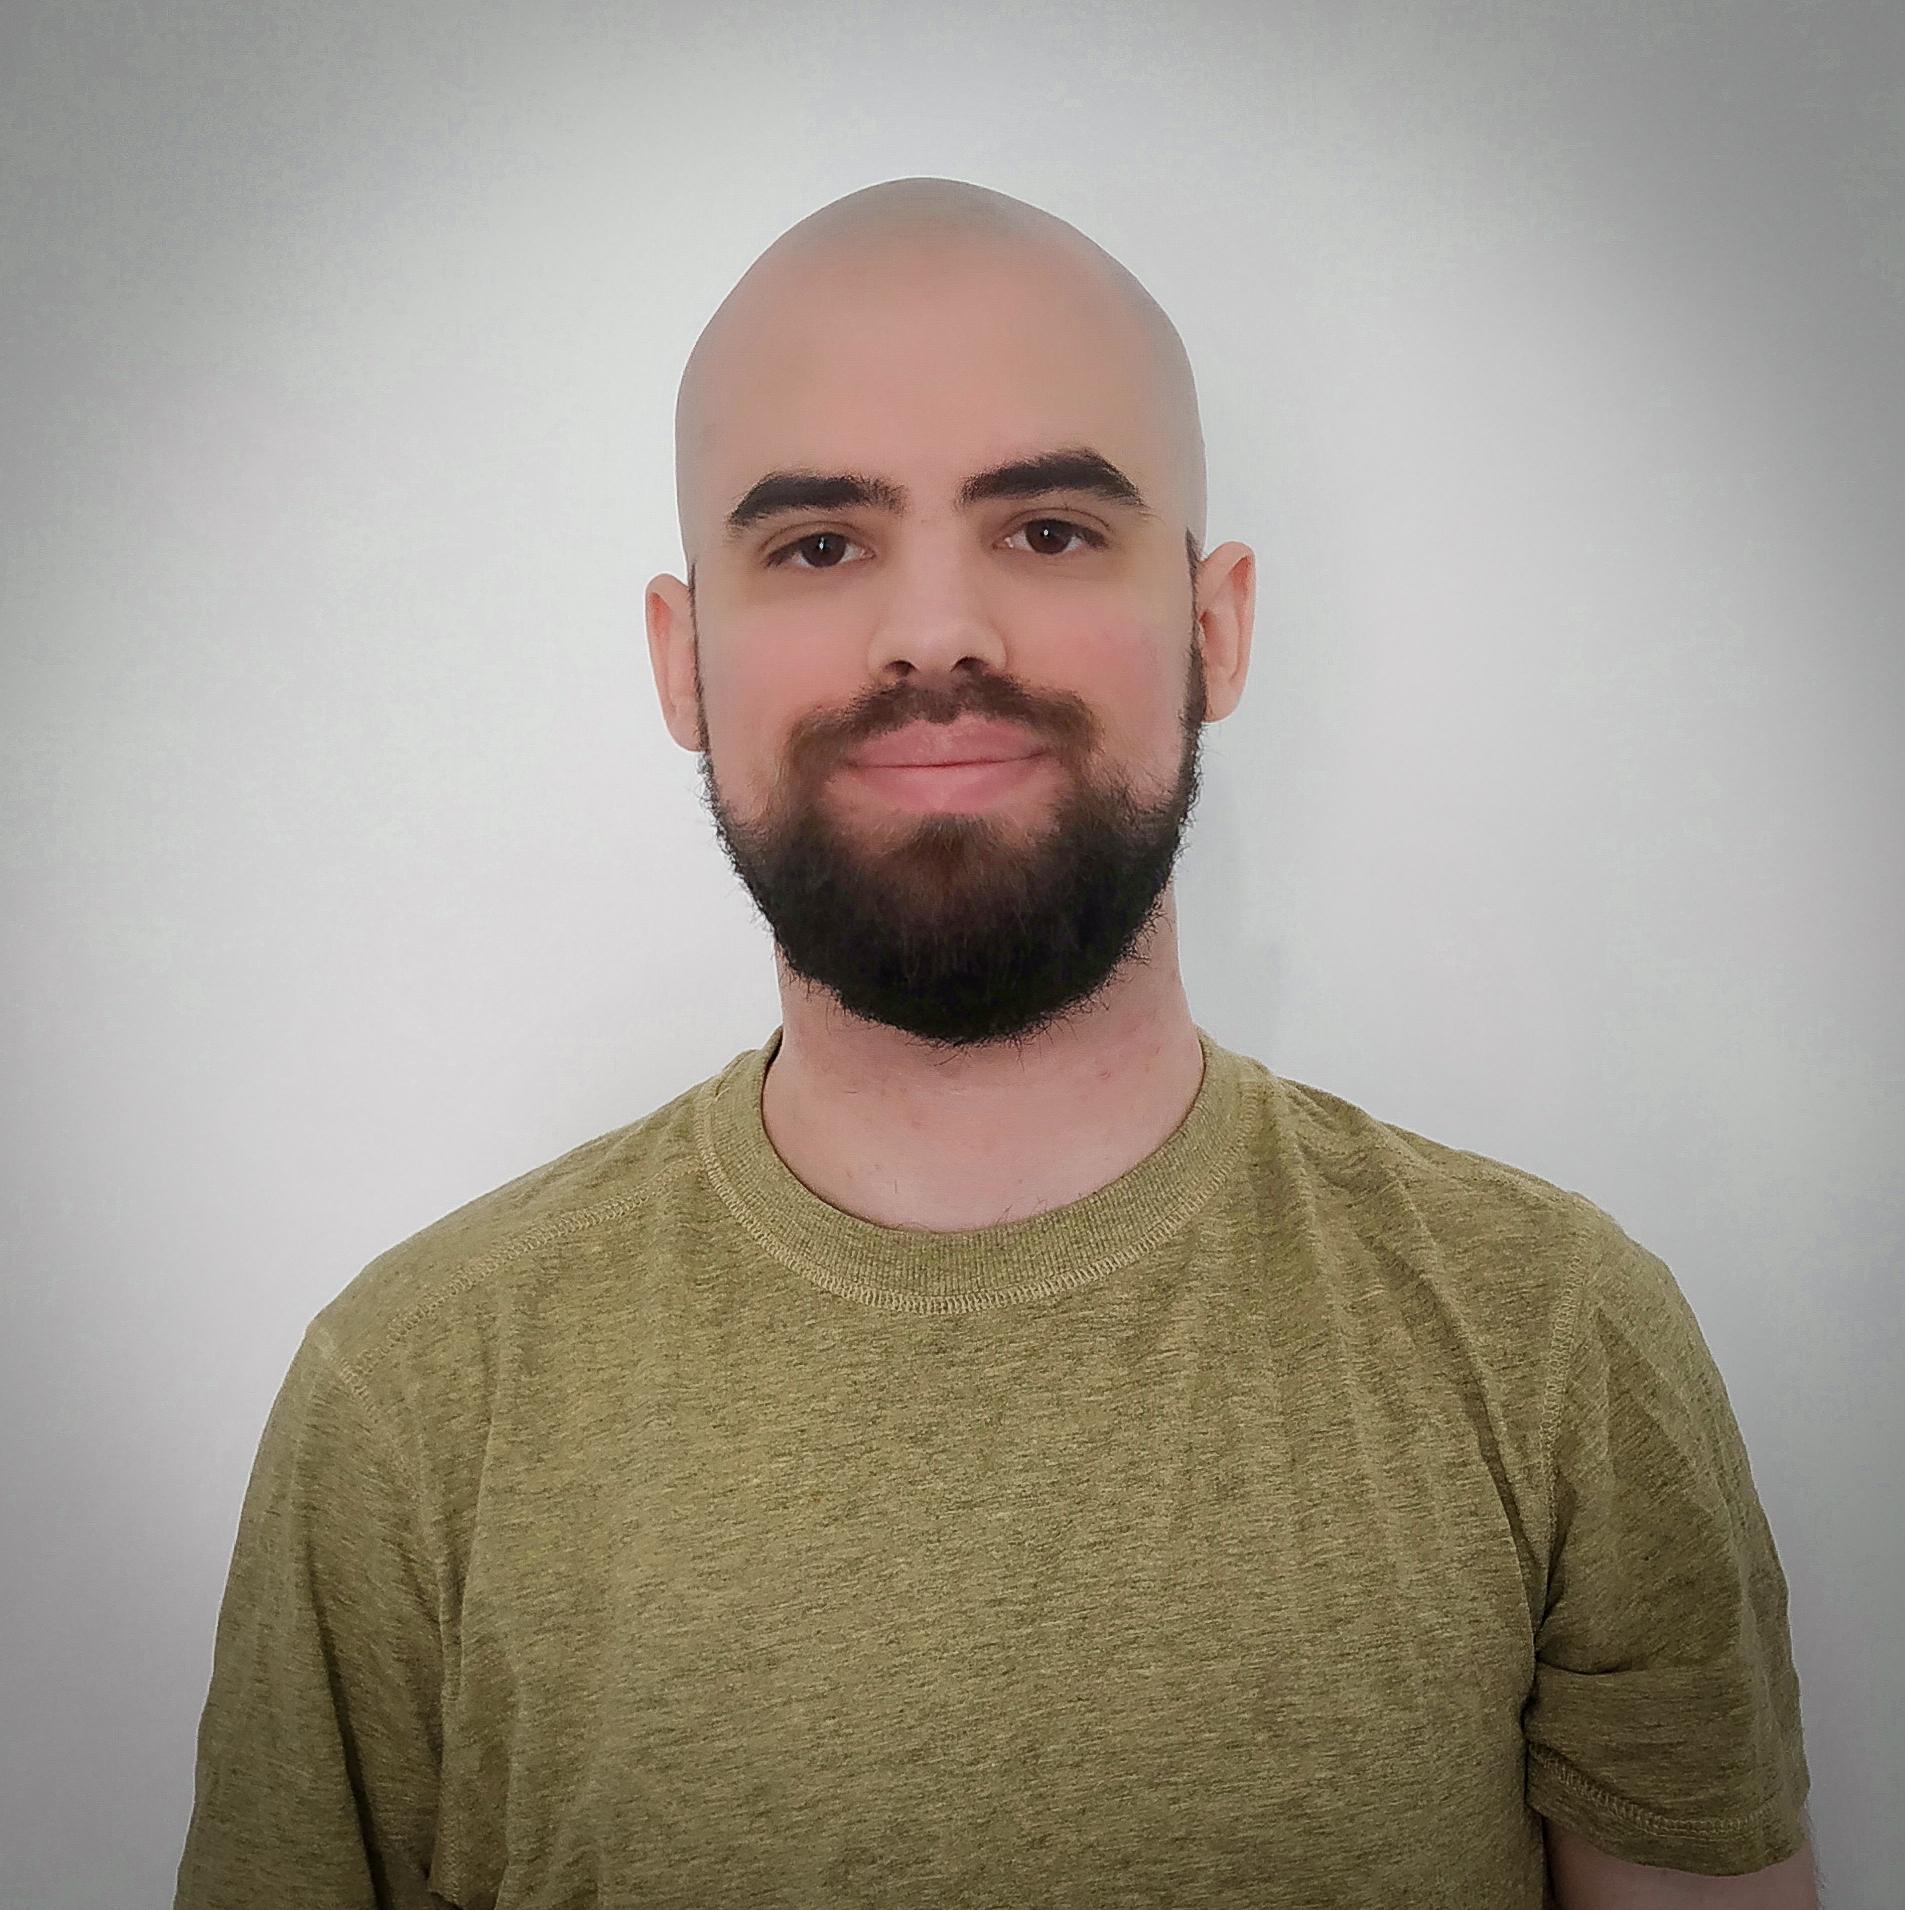 Hugo Almeida, Senior Software Developer at 3T Software Labs